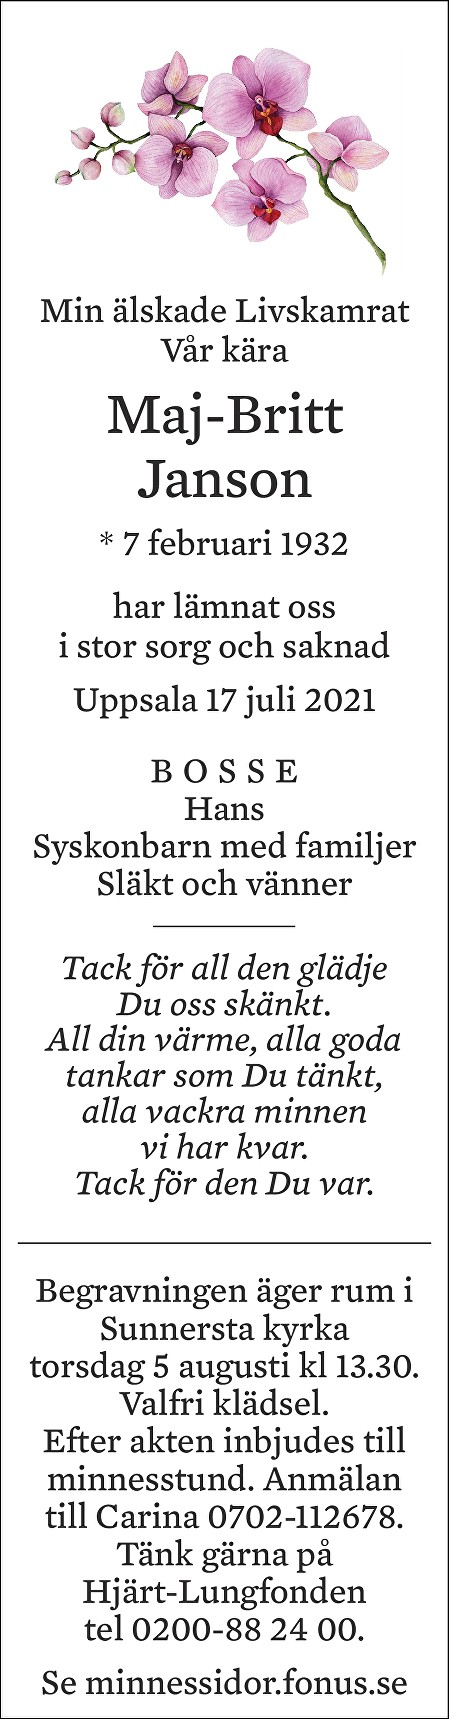 Maj-Britt Jansson Death notice